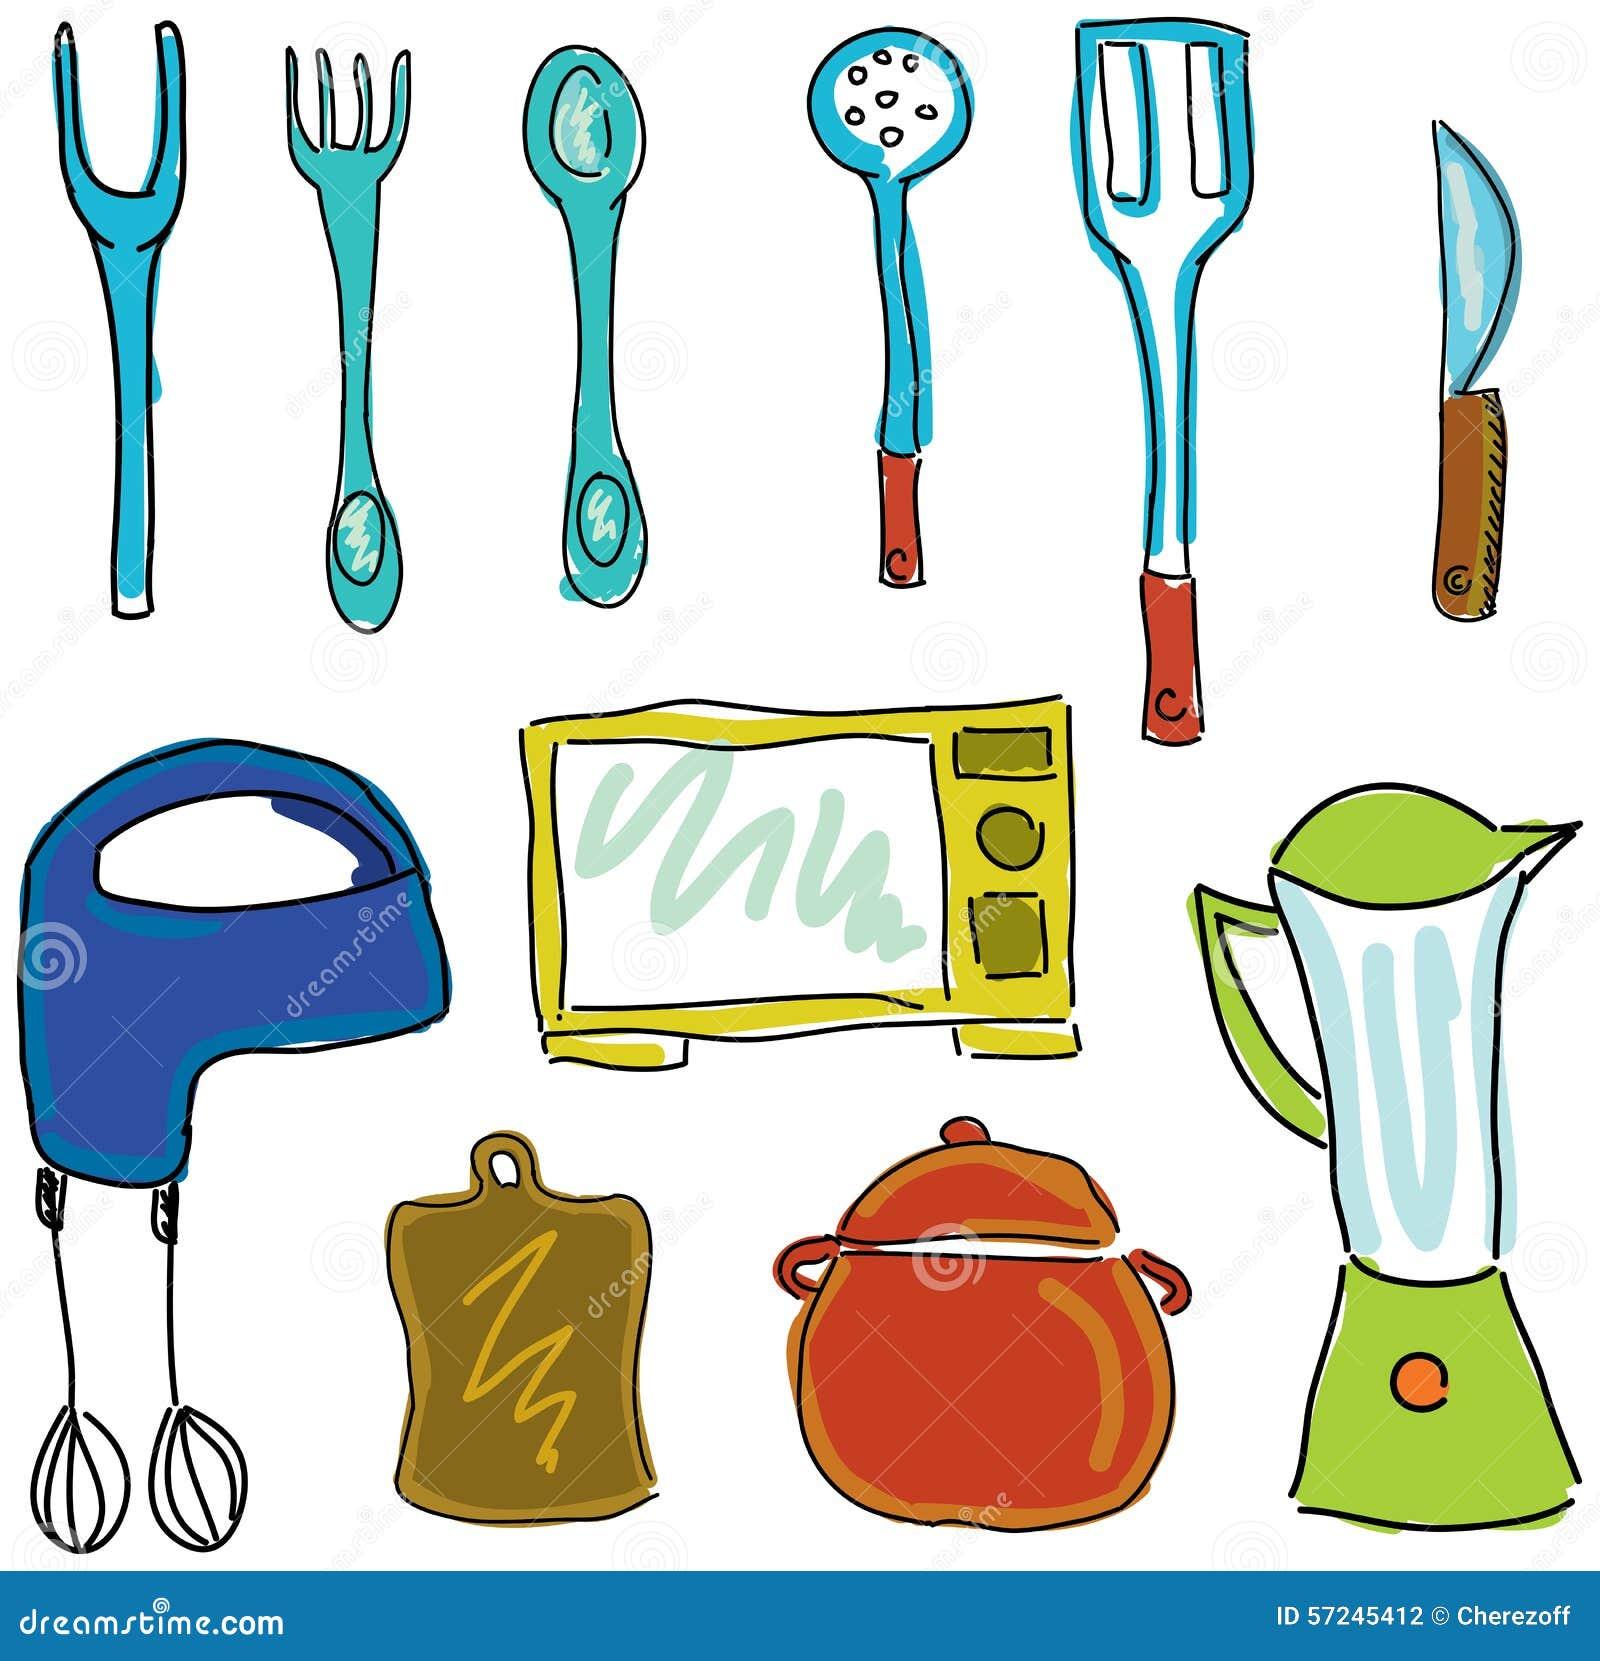 Drawn Kitchen Stuff Stock Vector Illustration Of Drawn 57245412